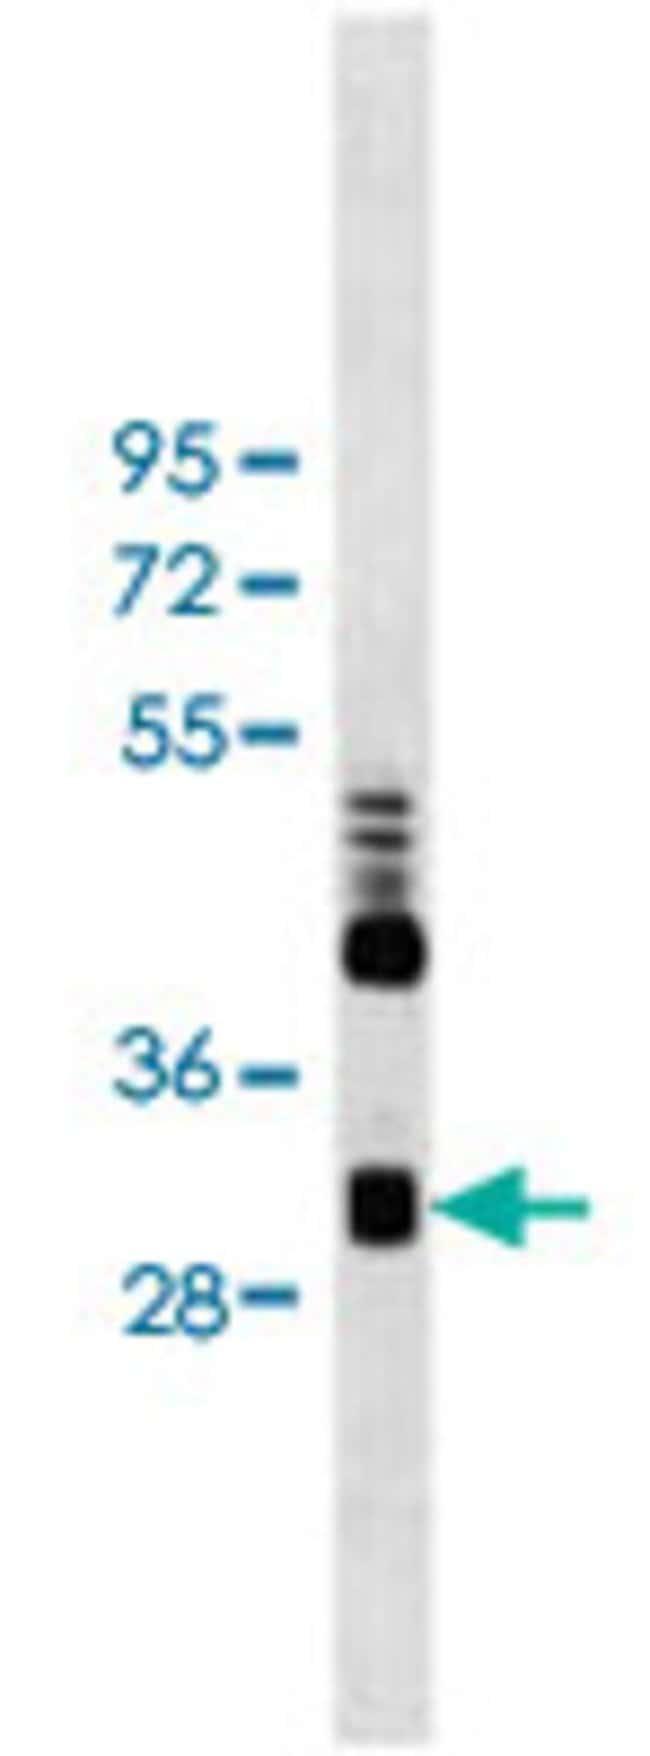 CLIC4 Mouse anti-Human, Clone: 17CT9.2.8, Abnova 400μL; Unlabeled:Antibodies